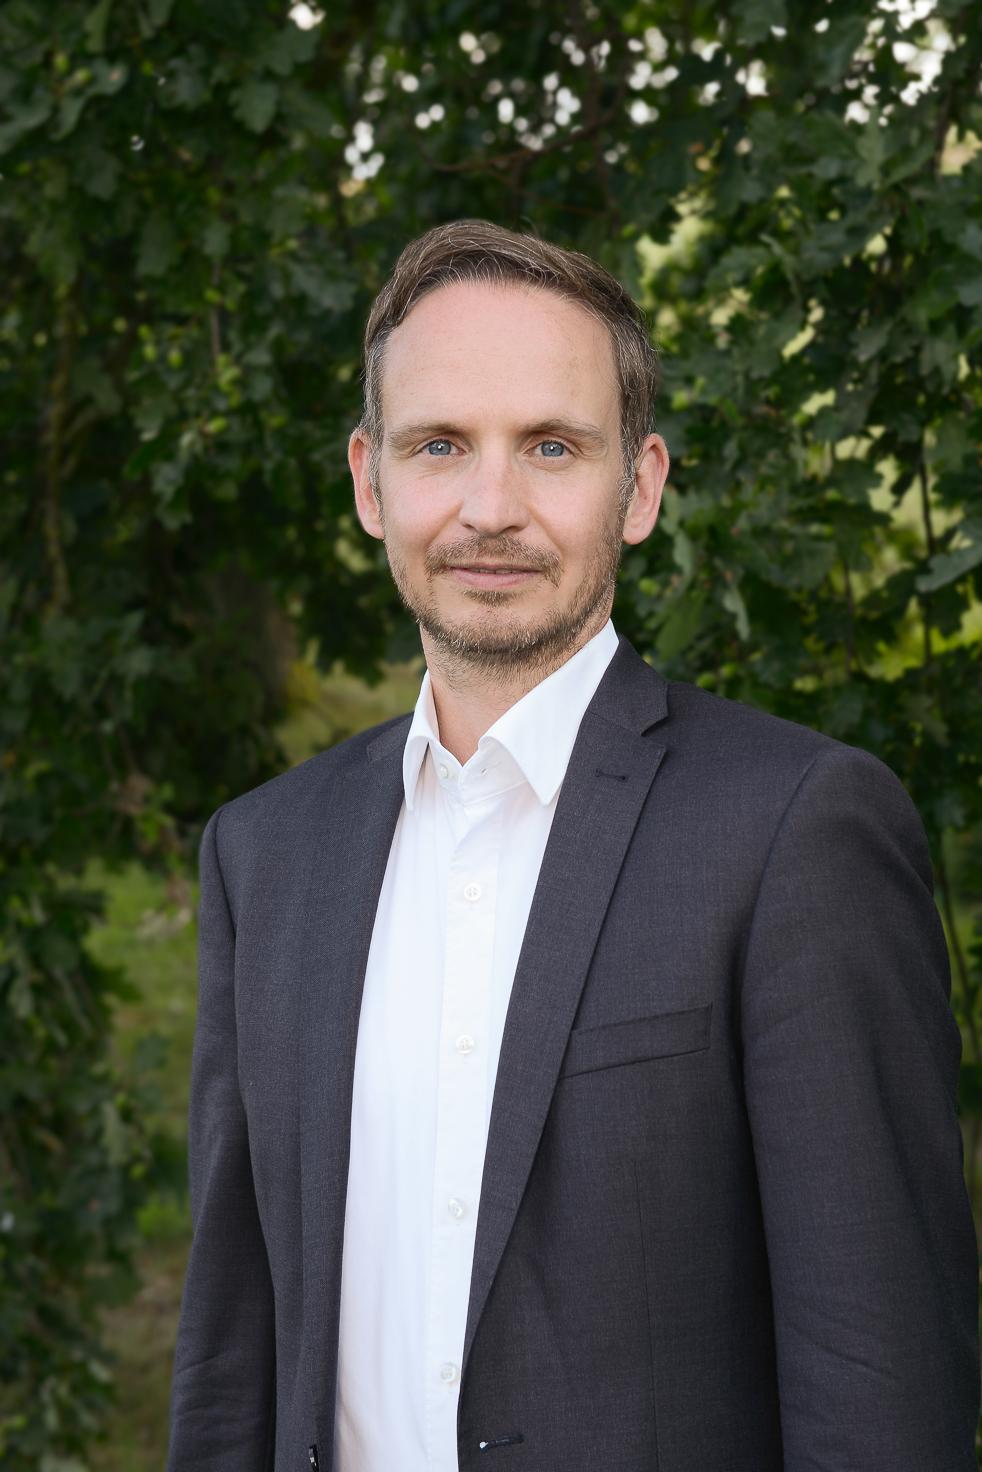 Jan Tomas Gierke